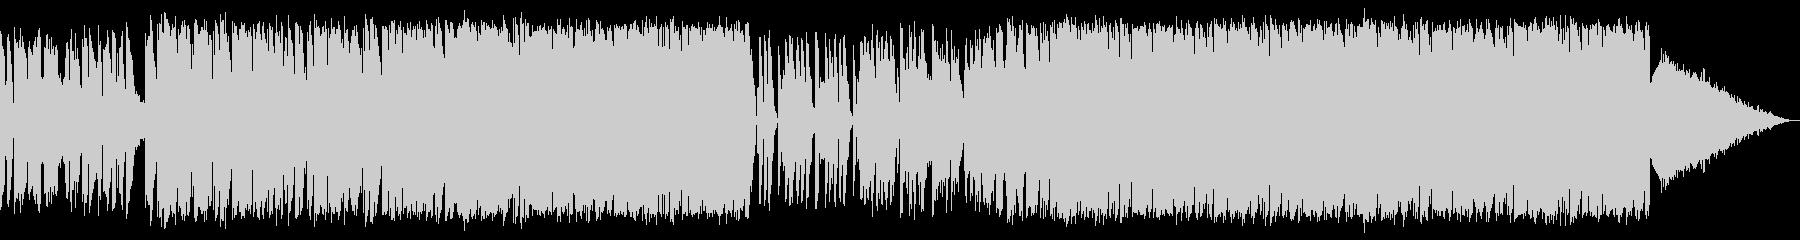 EDM  Track 08  の未再生の波形